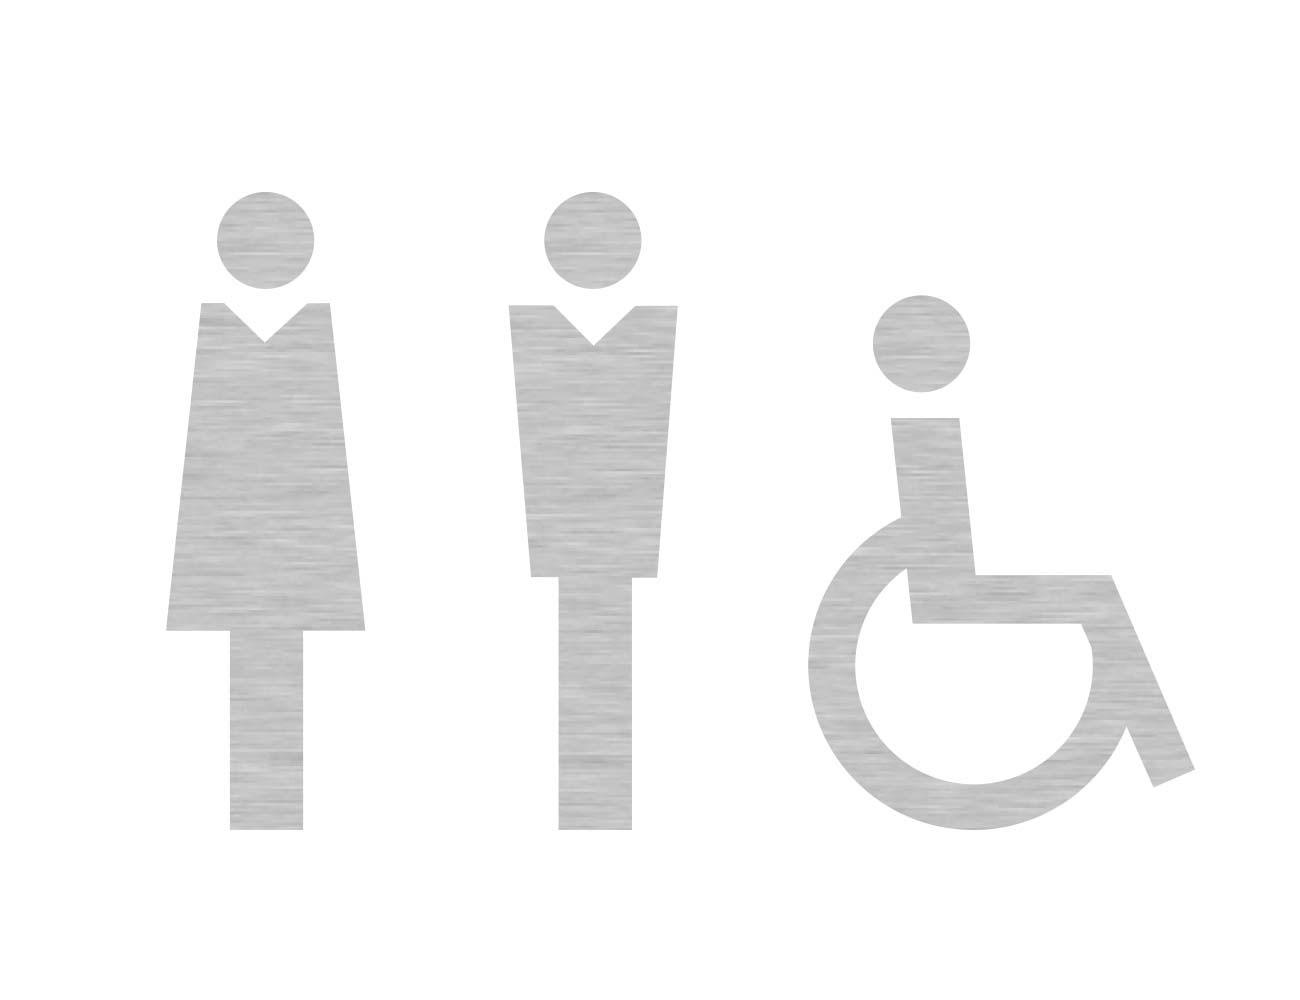 WC Piktogramme - Variante 1  - Dame/Herr/Rollstuhl